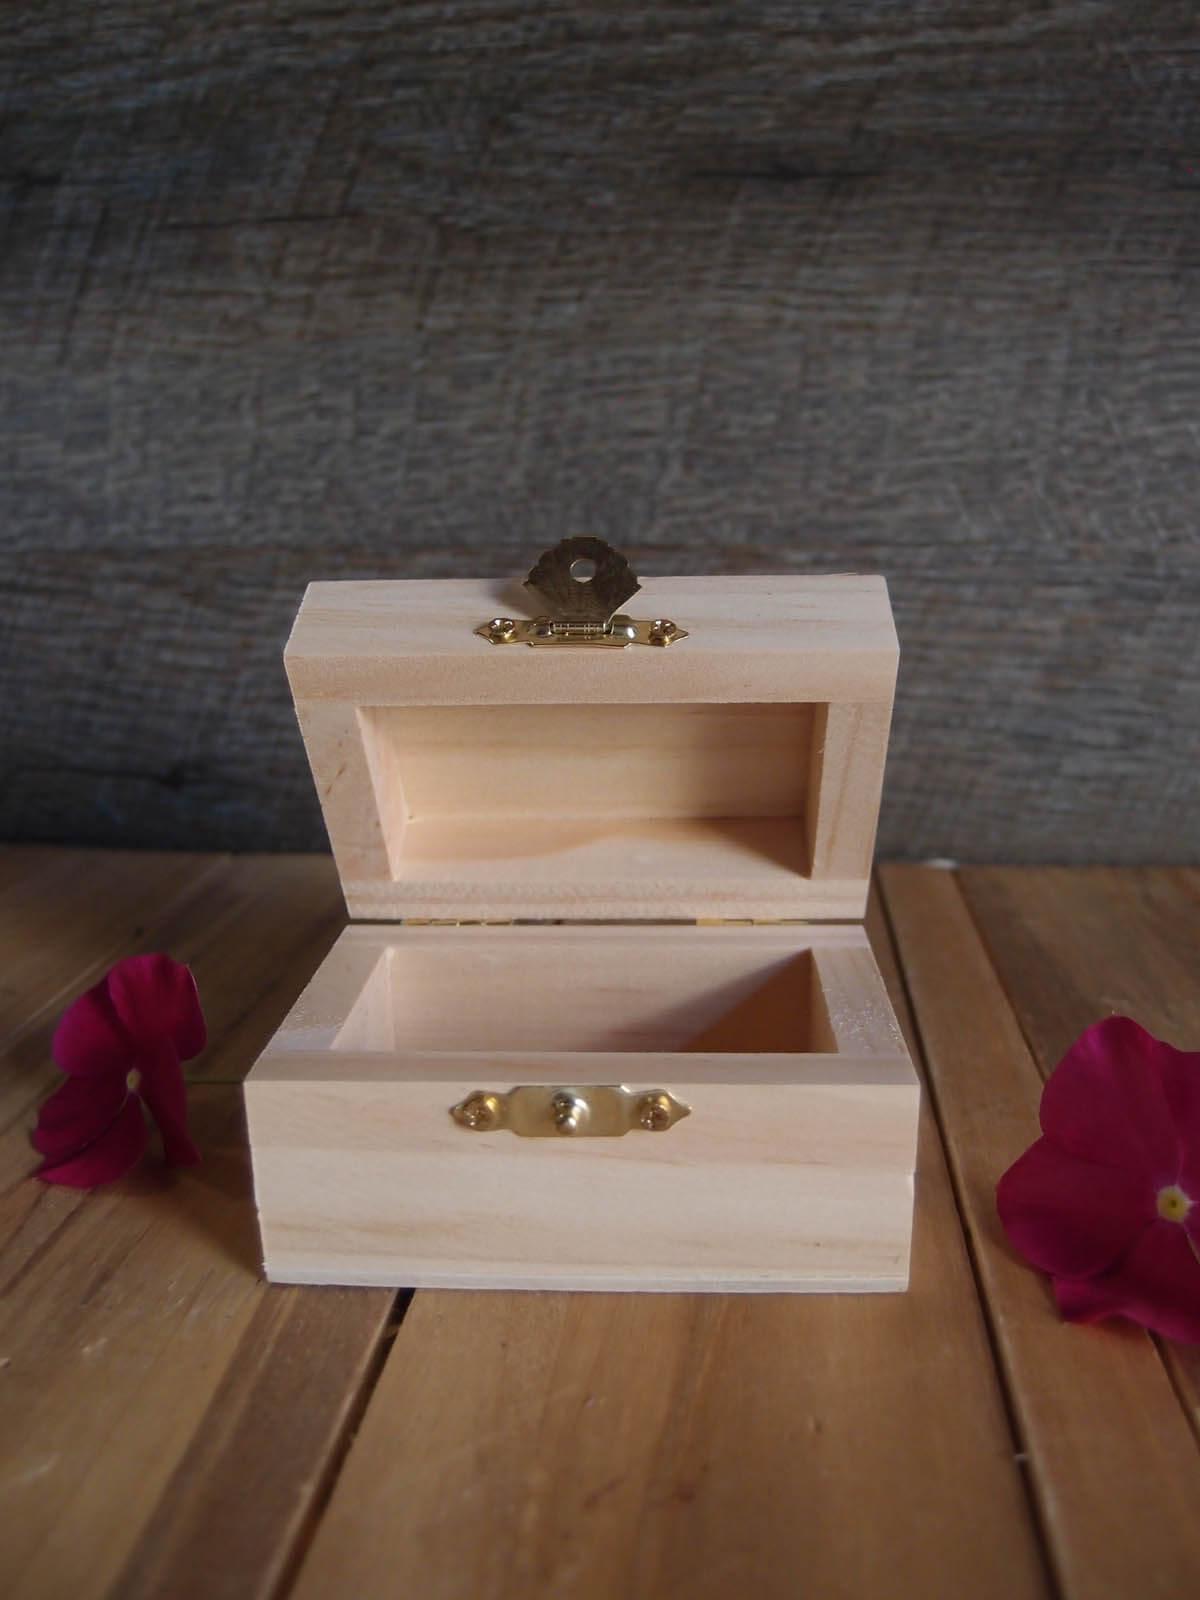 "Tiny Unfinished Wood Latched Box 3.25"" x 2.25"""